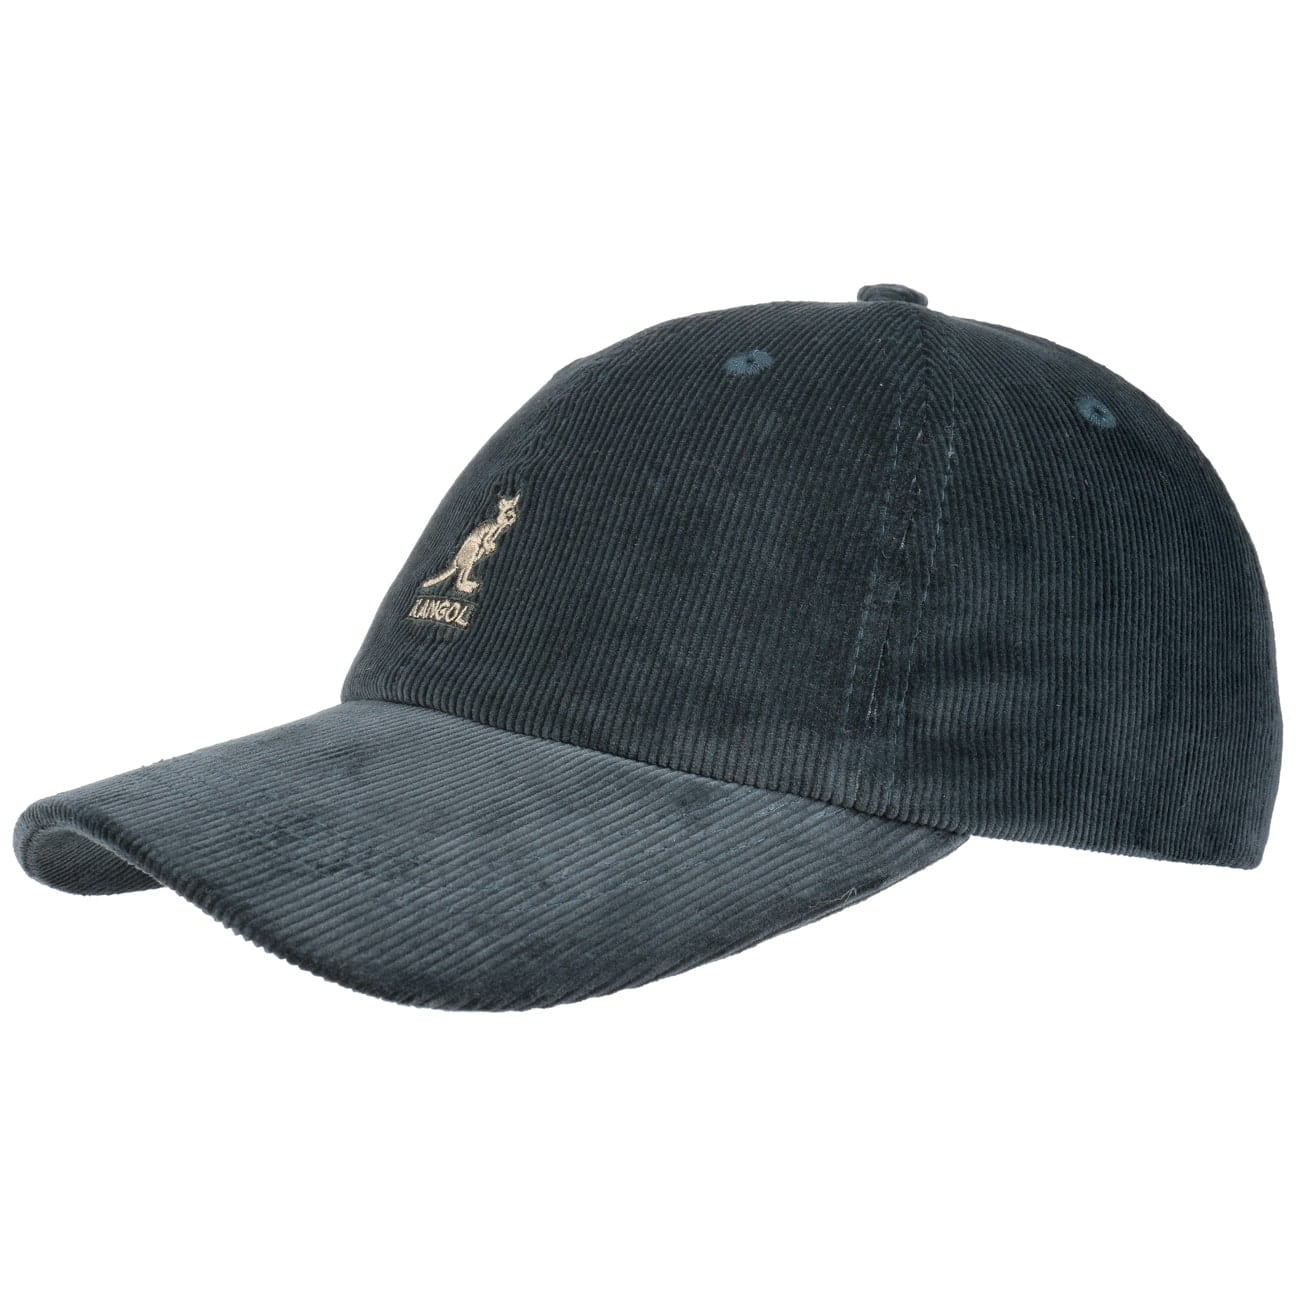 classic-corduroy-baseballcap-by-kangol-baseballcap